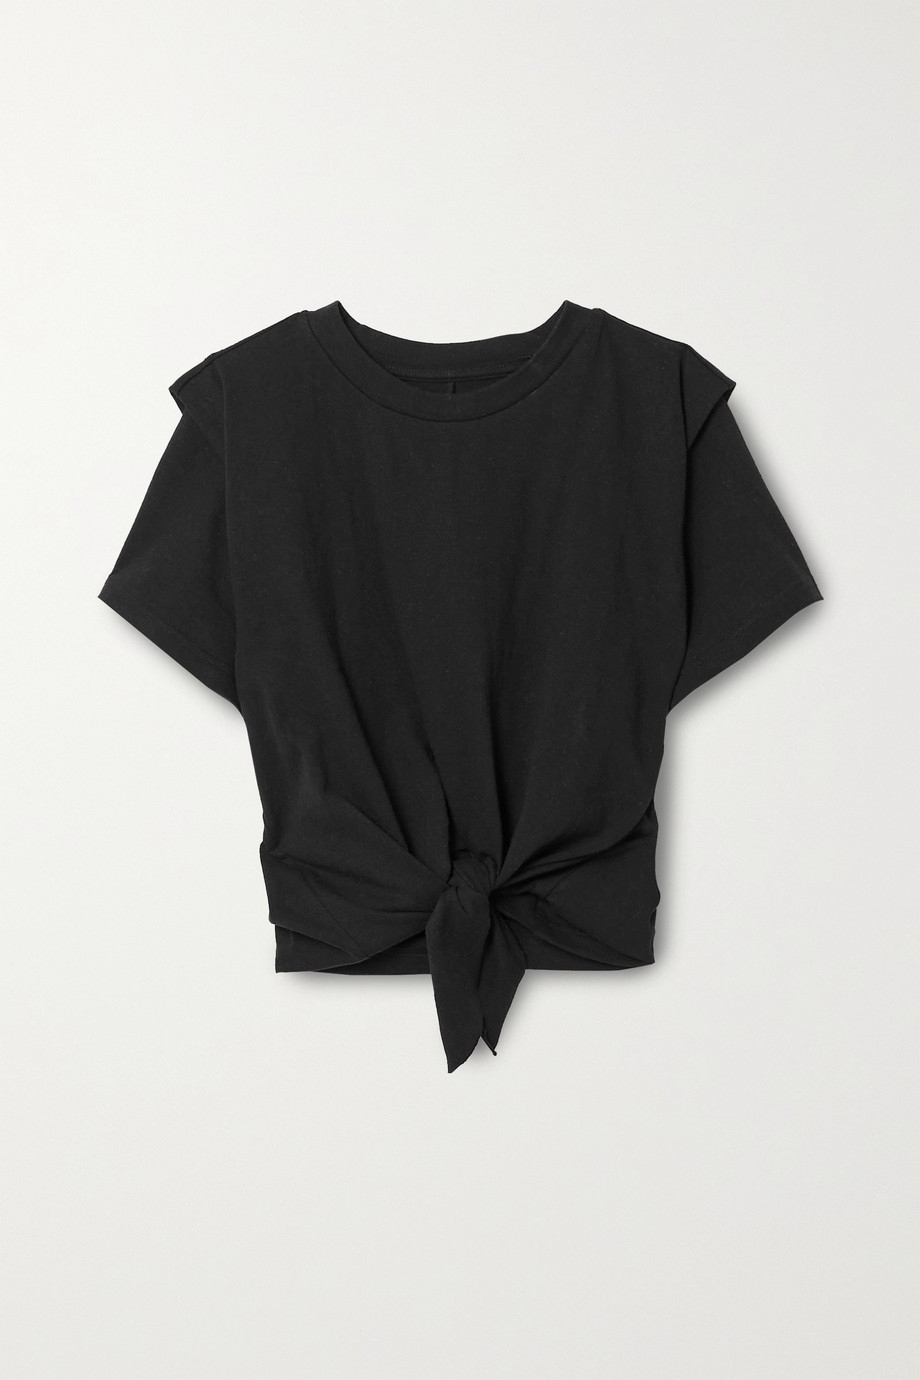 Isabel Marant Zelito verkürztes T-Shirt aus Baumwoll-Jersey zum Binden